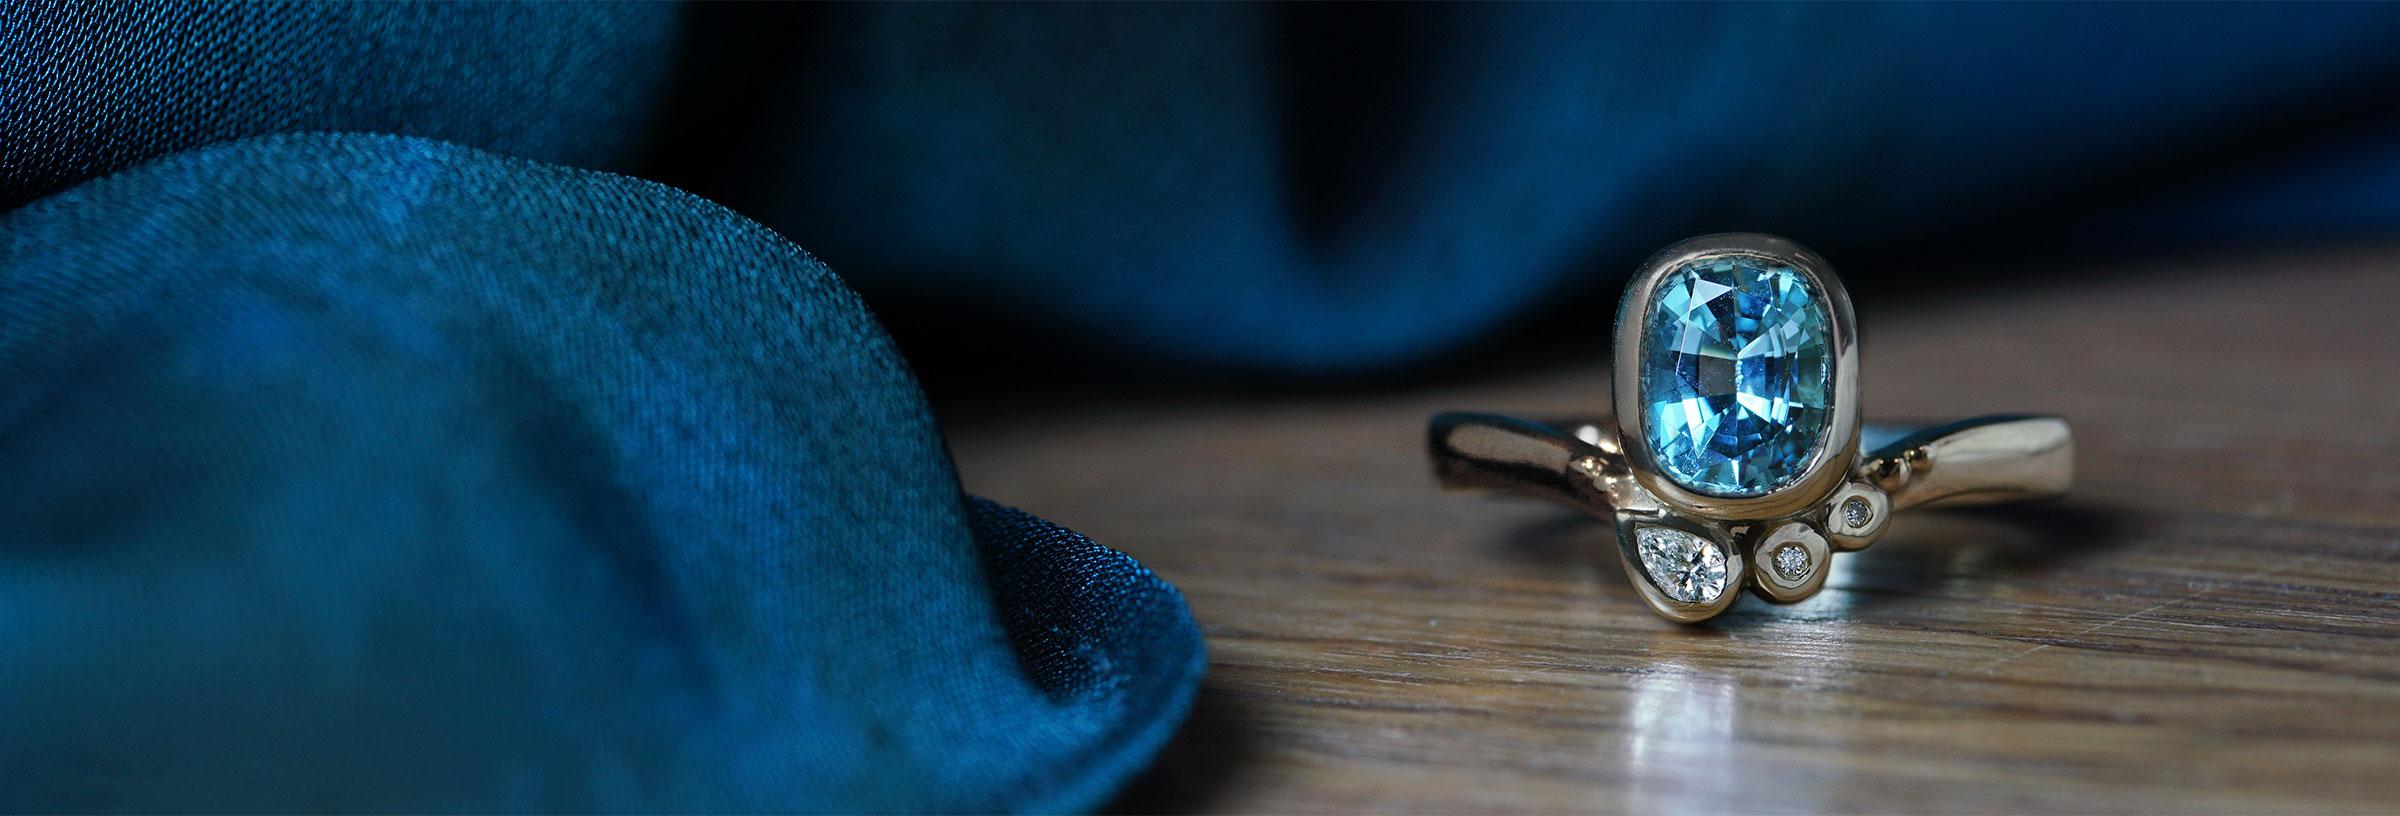 white-gold-oval-cut-aquamarine-and-diamond-engagement-ring